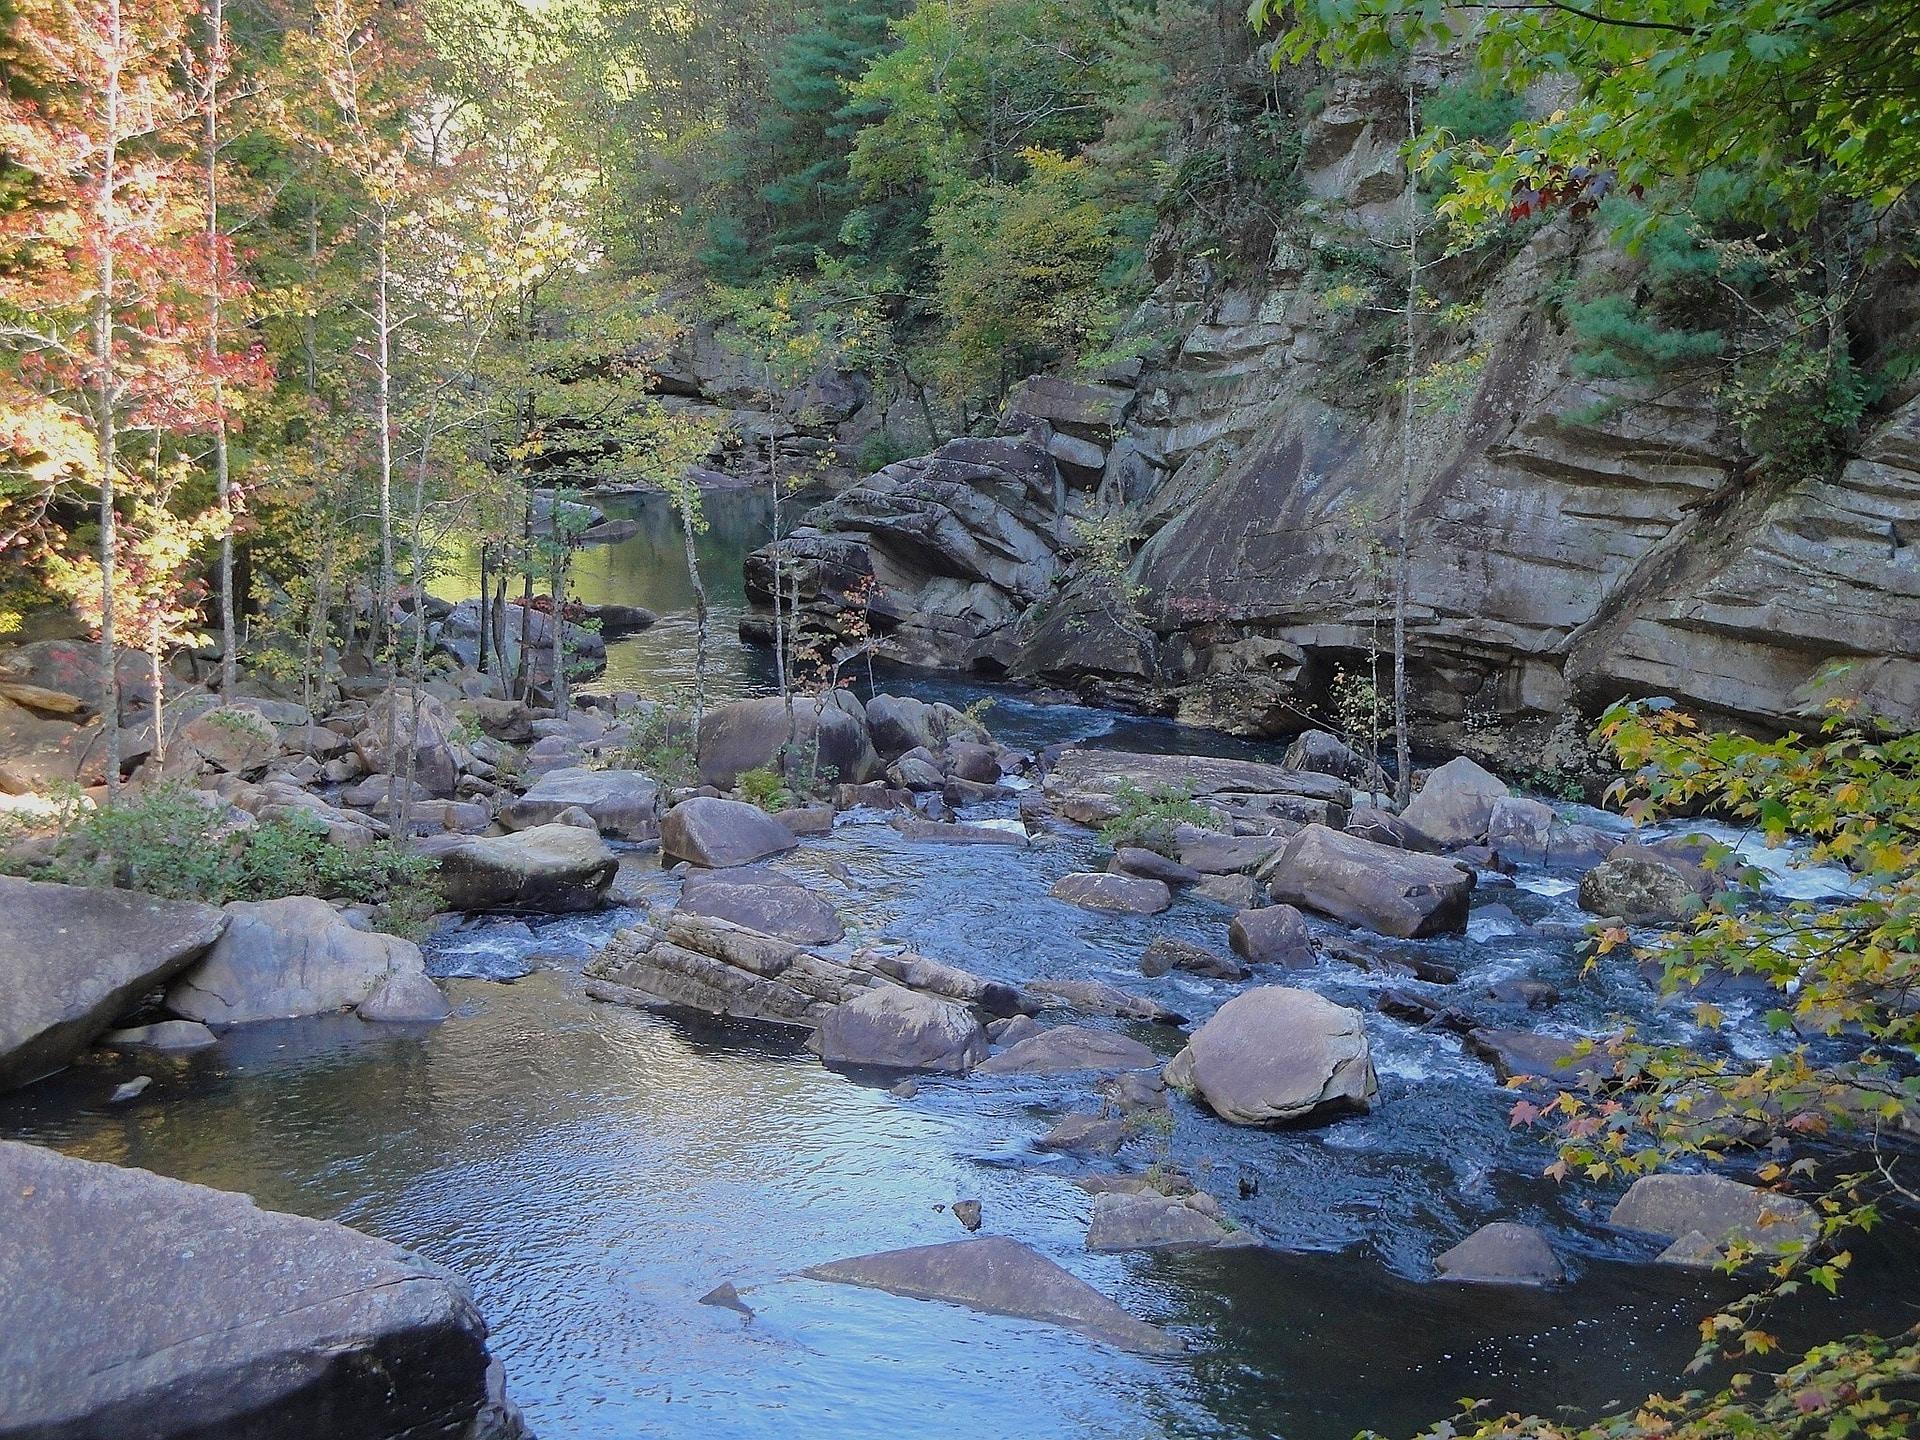 rocky stream in the Georgia mountains